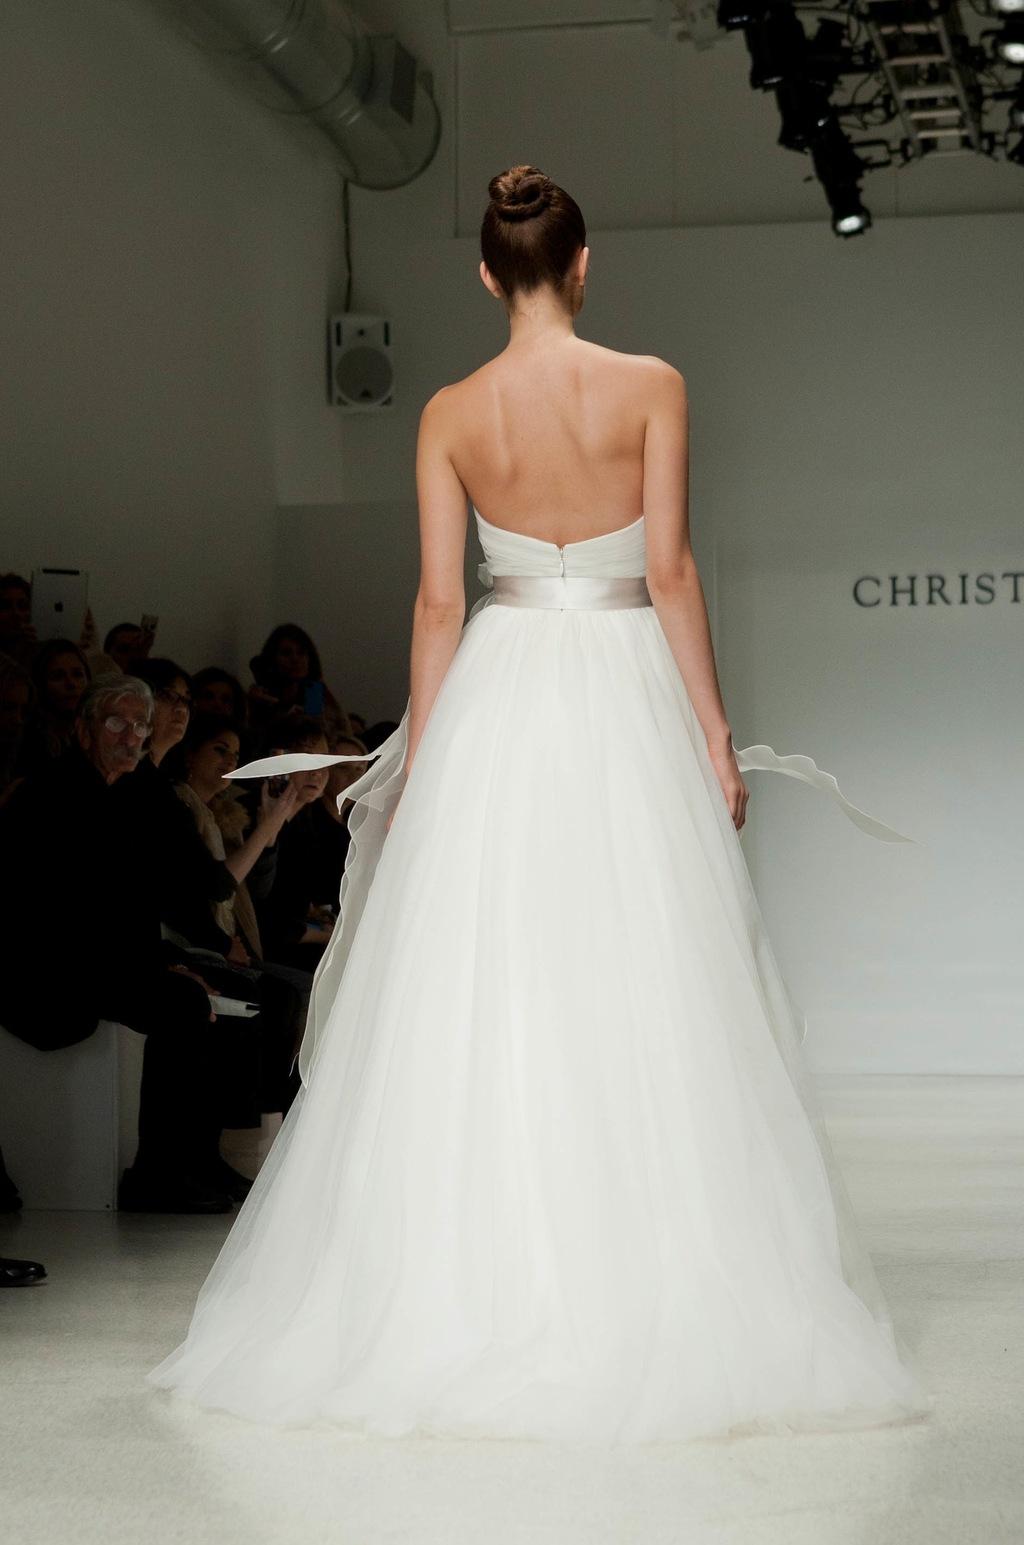 2012_wedding_dress_christos_bridal_gowns_charlotte_back.full